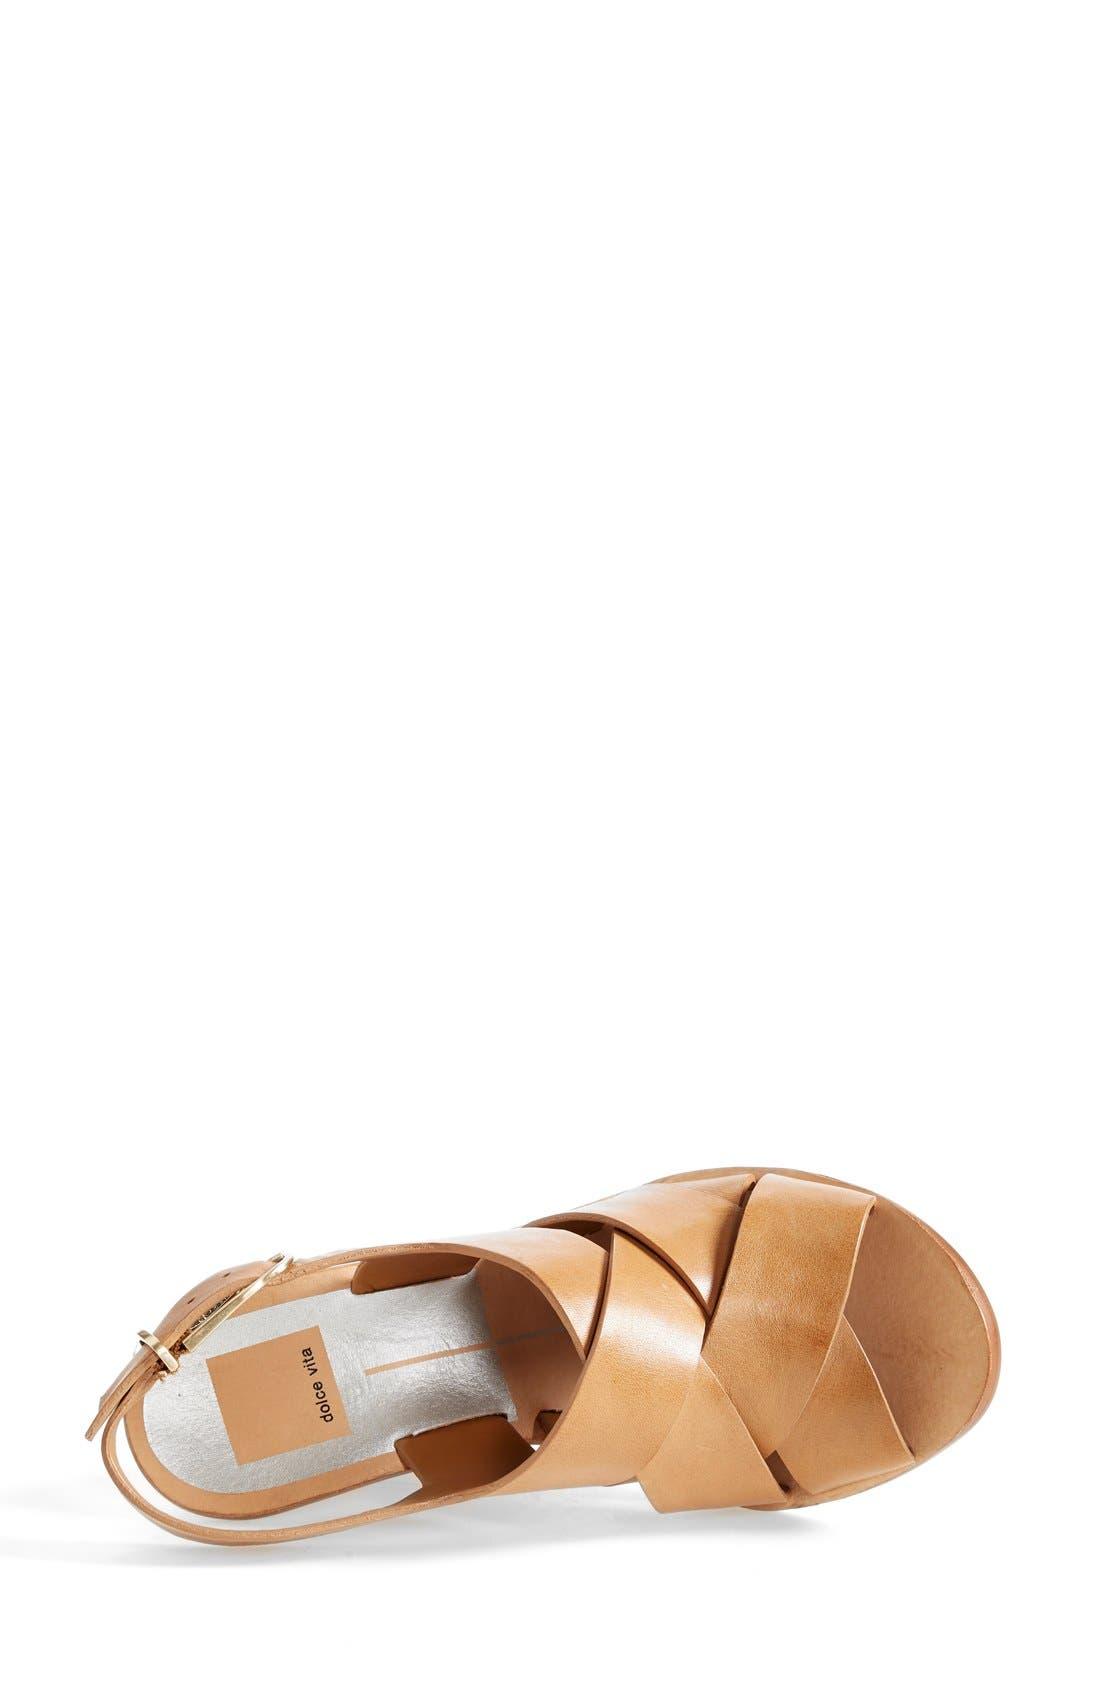 Alternate Image 3  - Dolce Vita 'Remie' Sandal (Women)